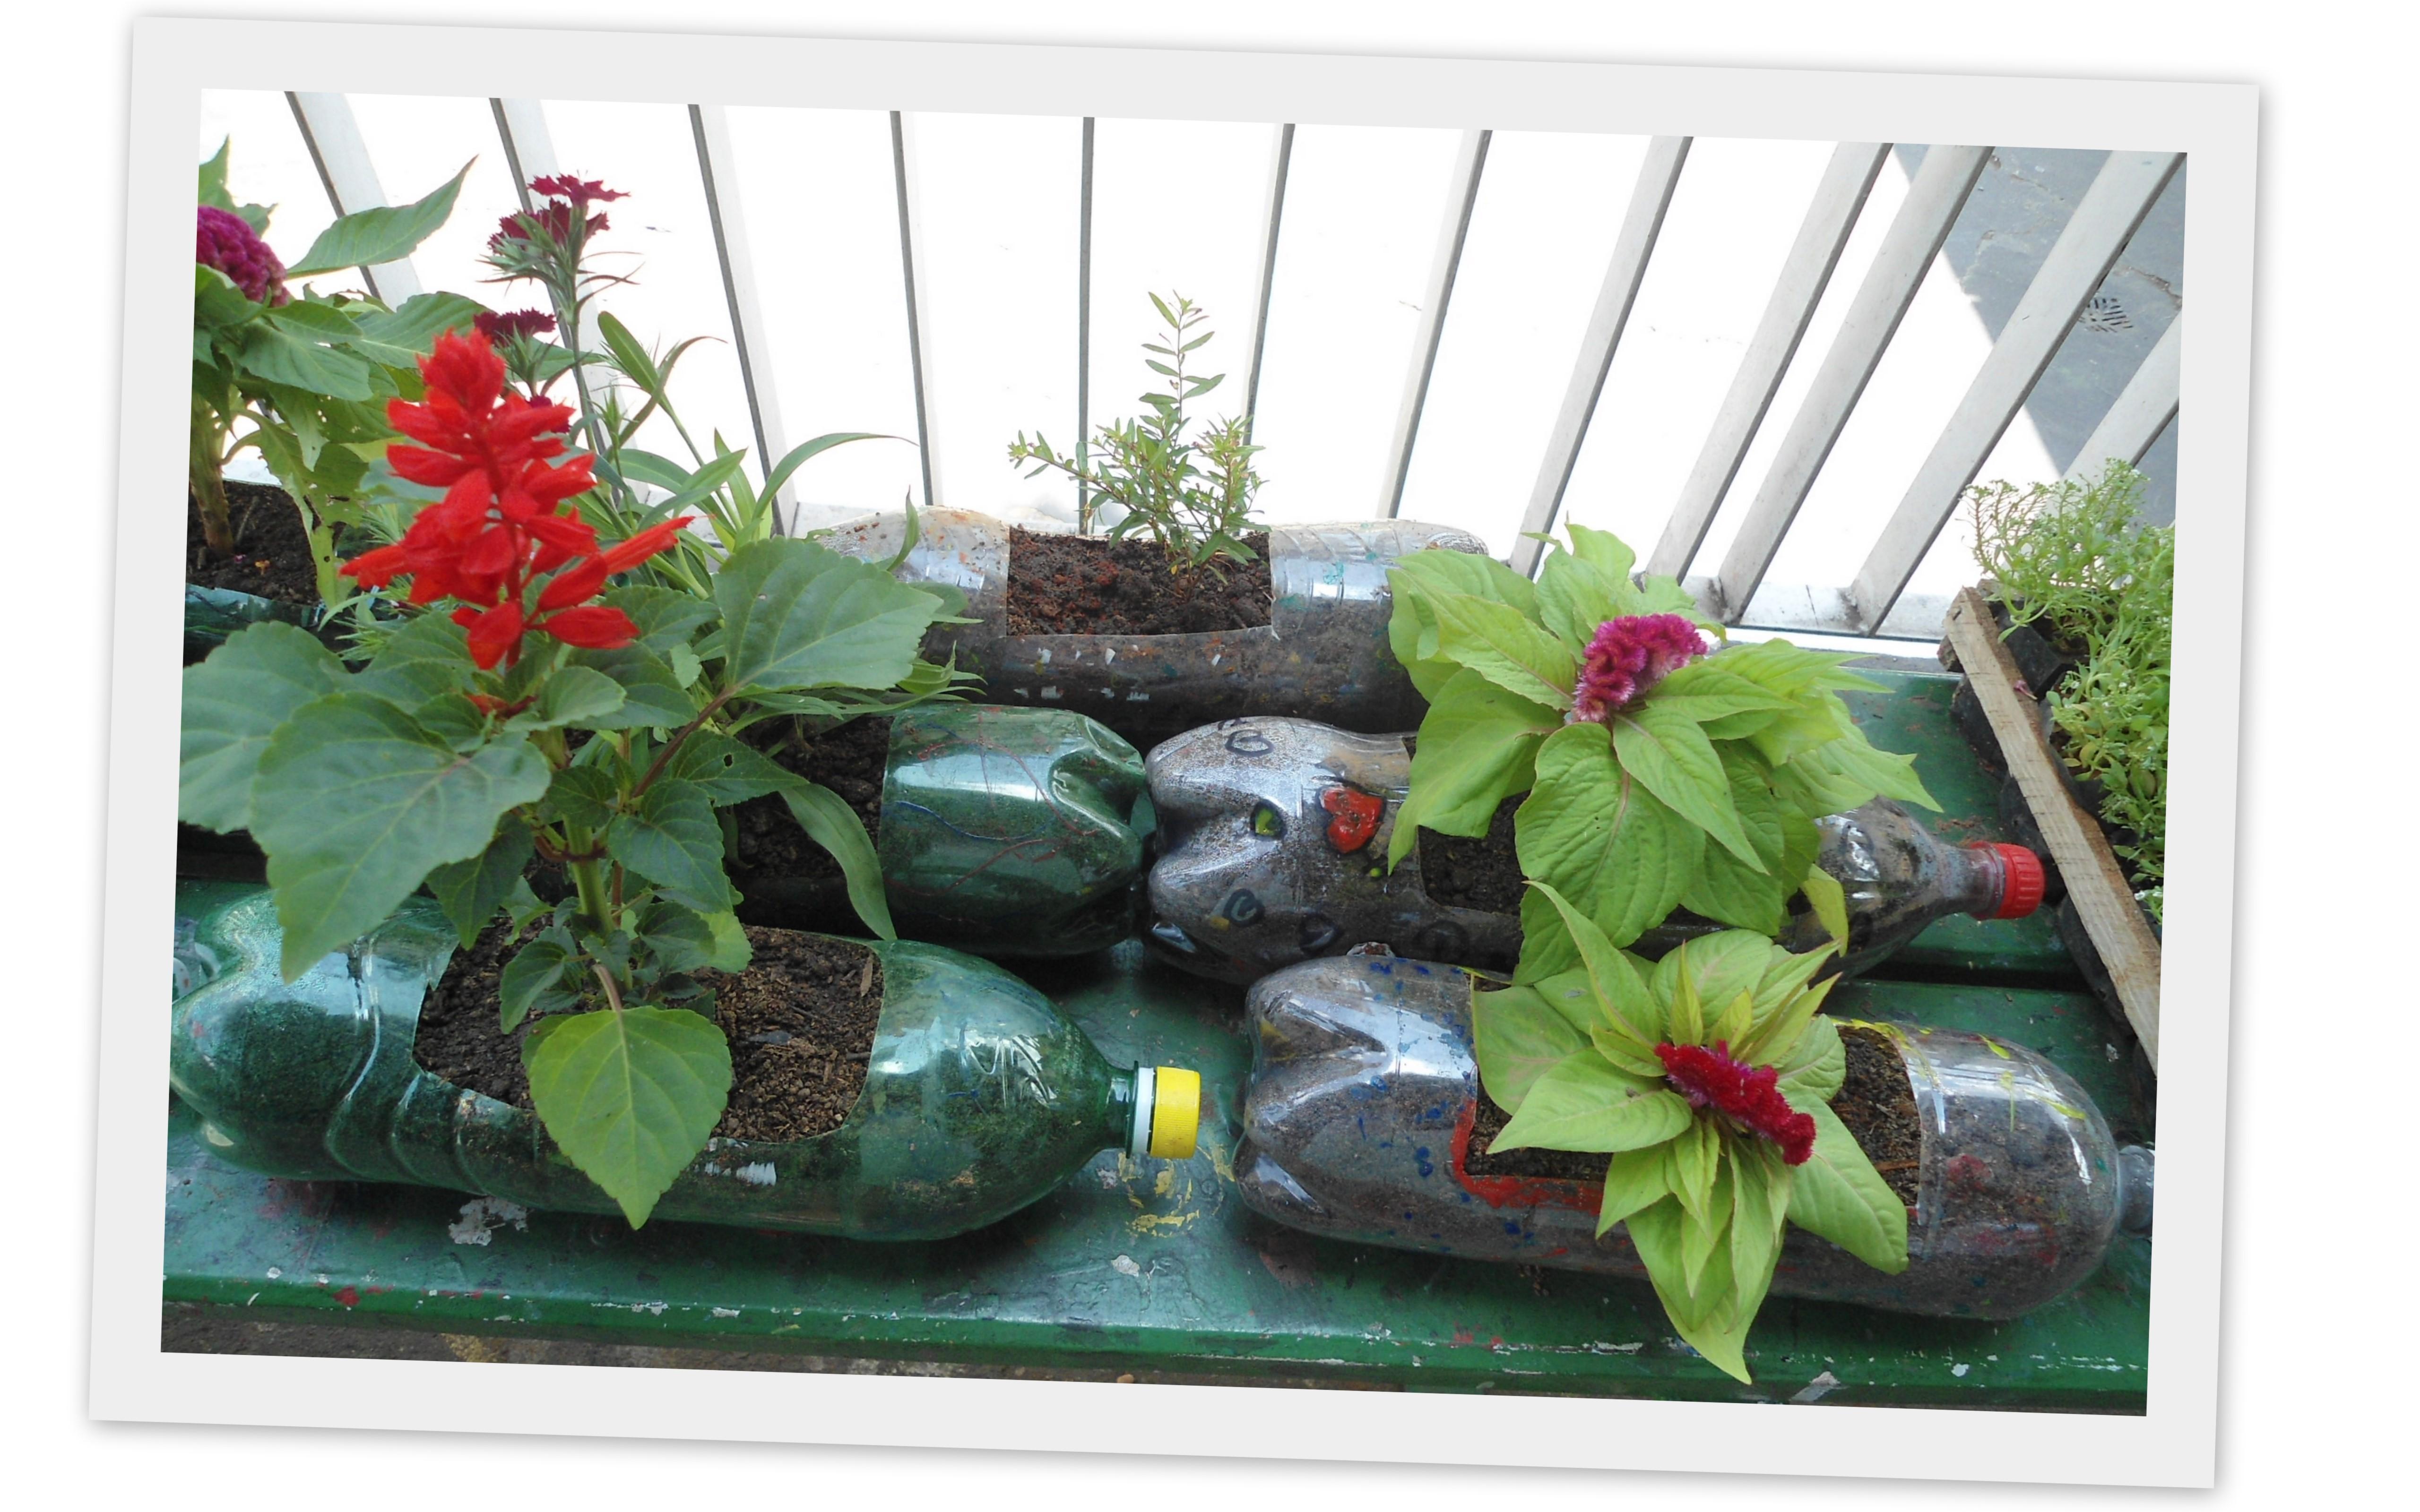 jardim vertical de garrafa pet passo a passo:Jardim Suspenso Com Garrafas Pet